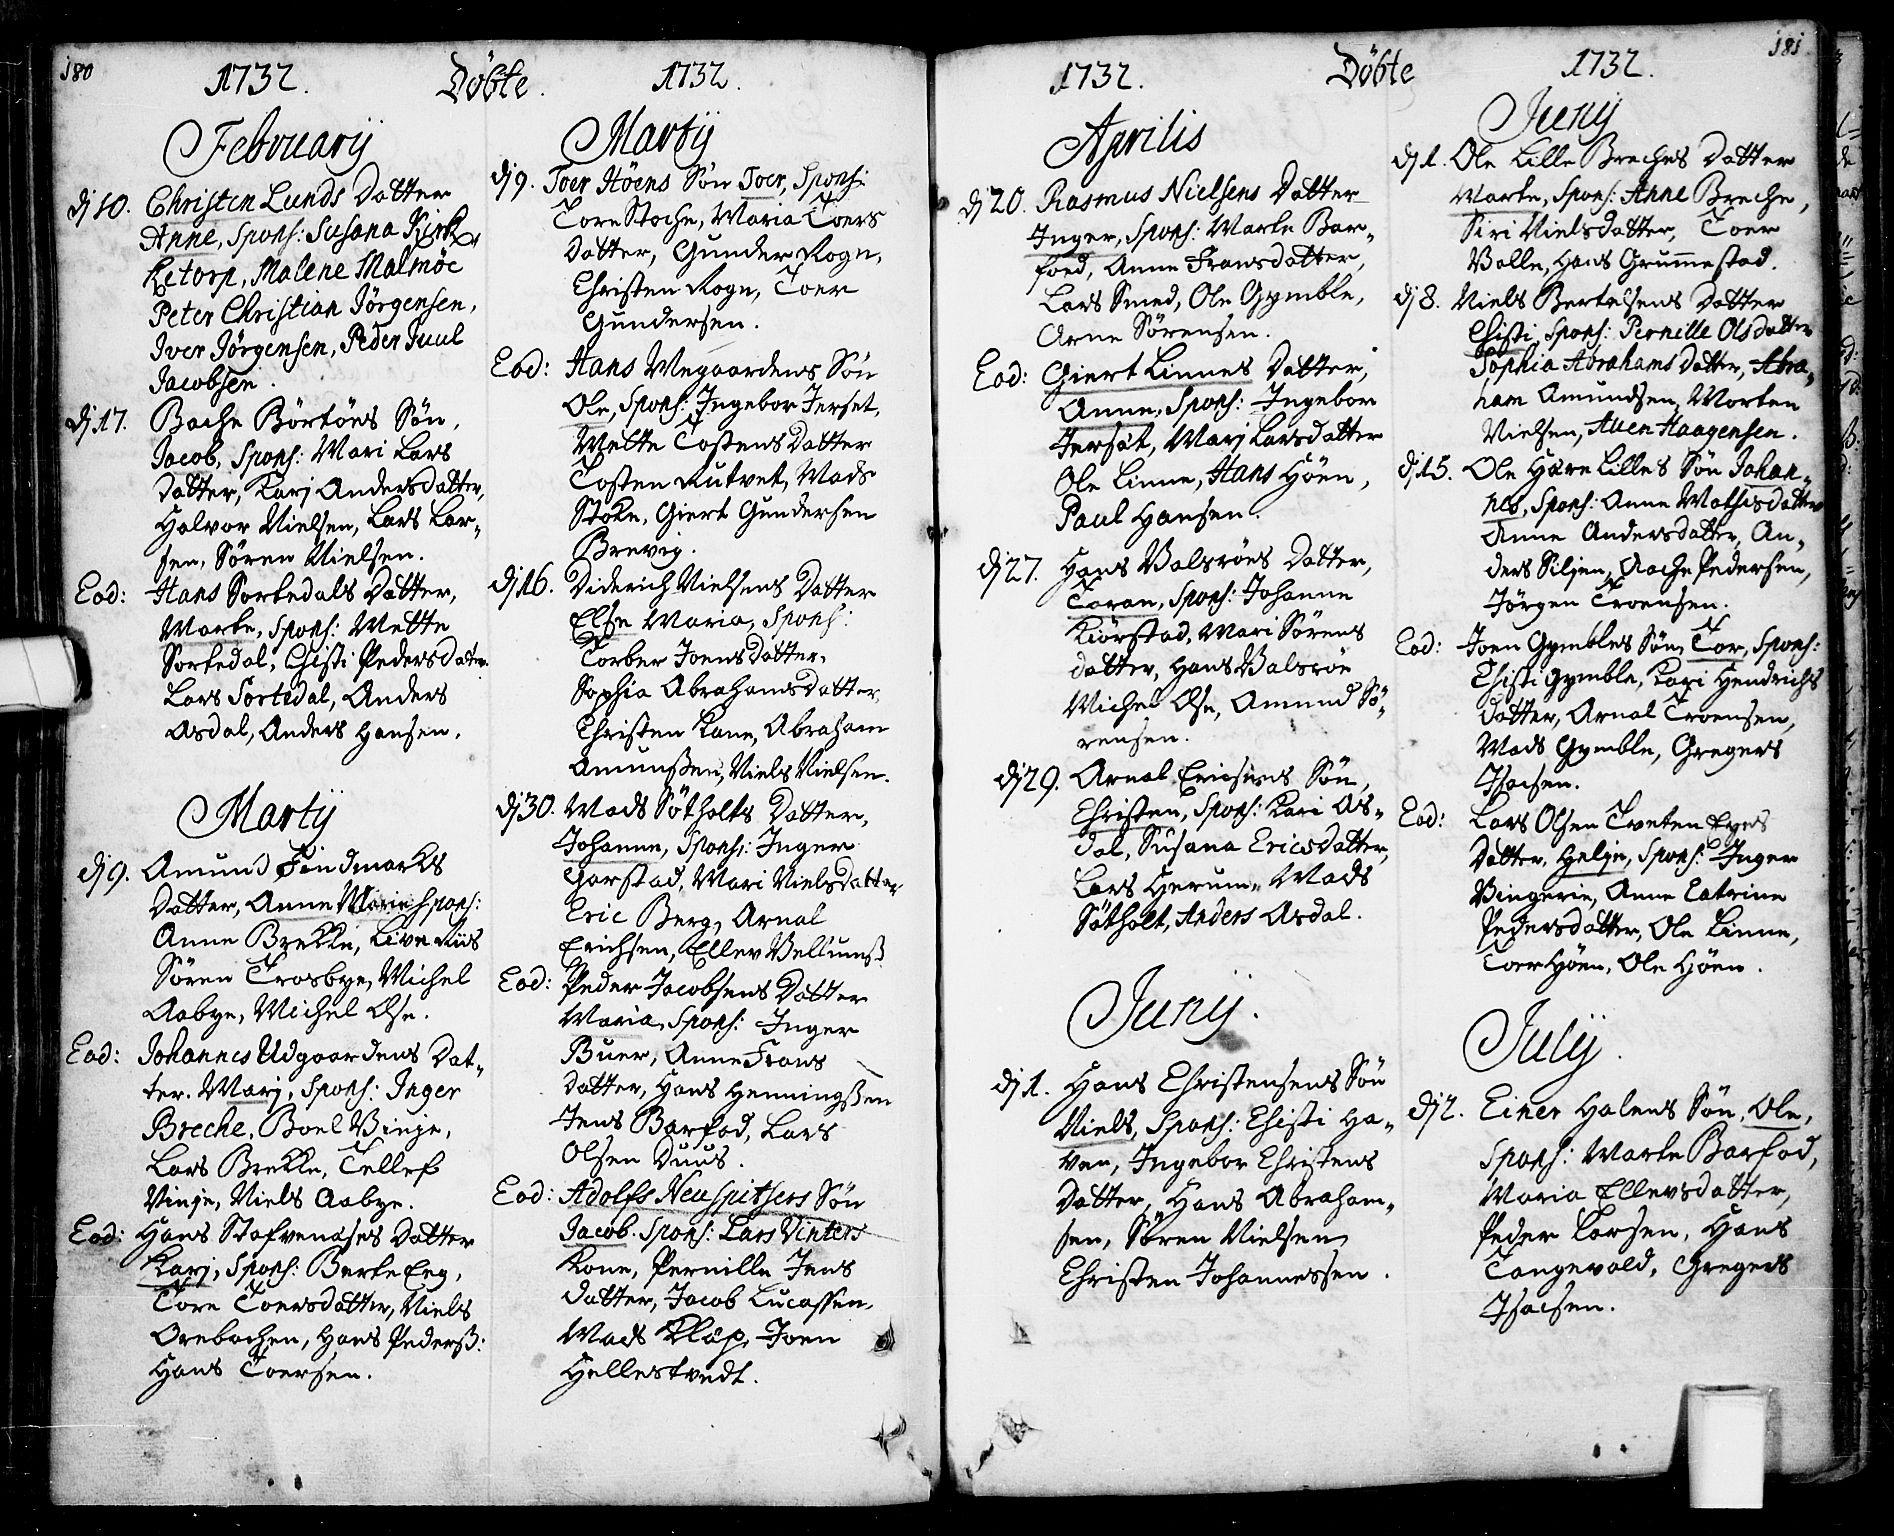 SAKO, Bamble kirkebøker, F/Fa/L0001: Ministerialbok nr. I 1, 1702-1774, s. 180-181